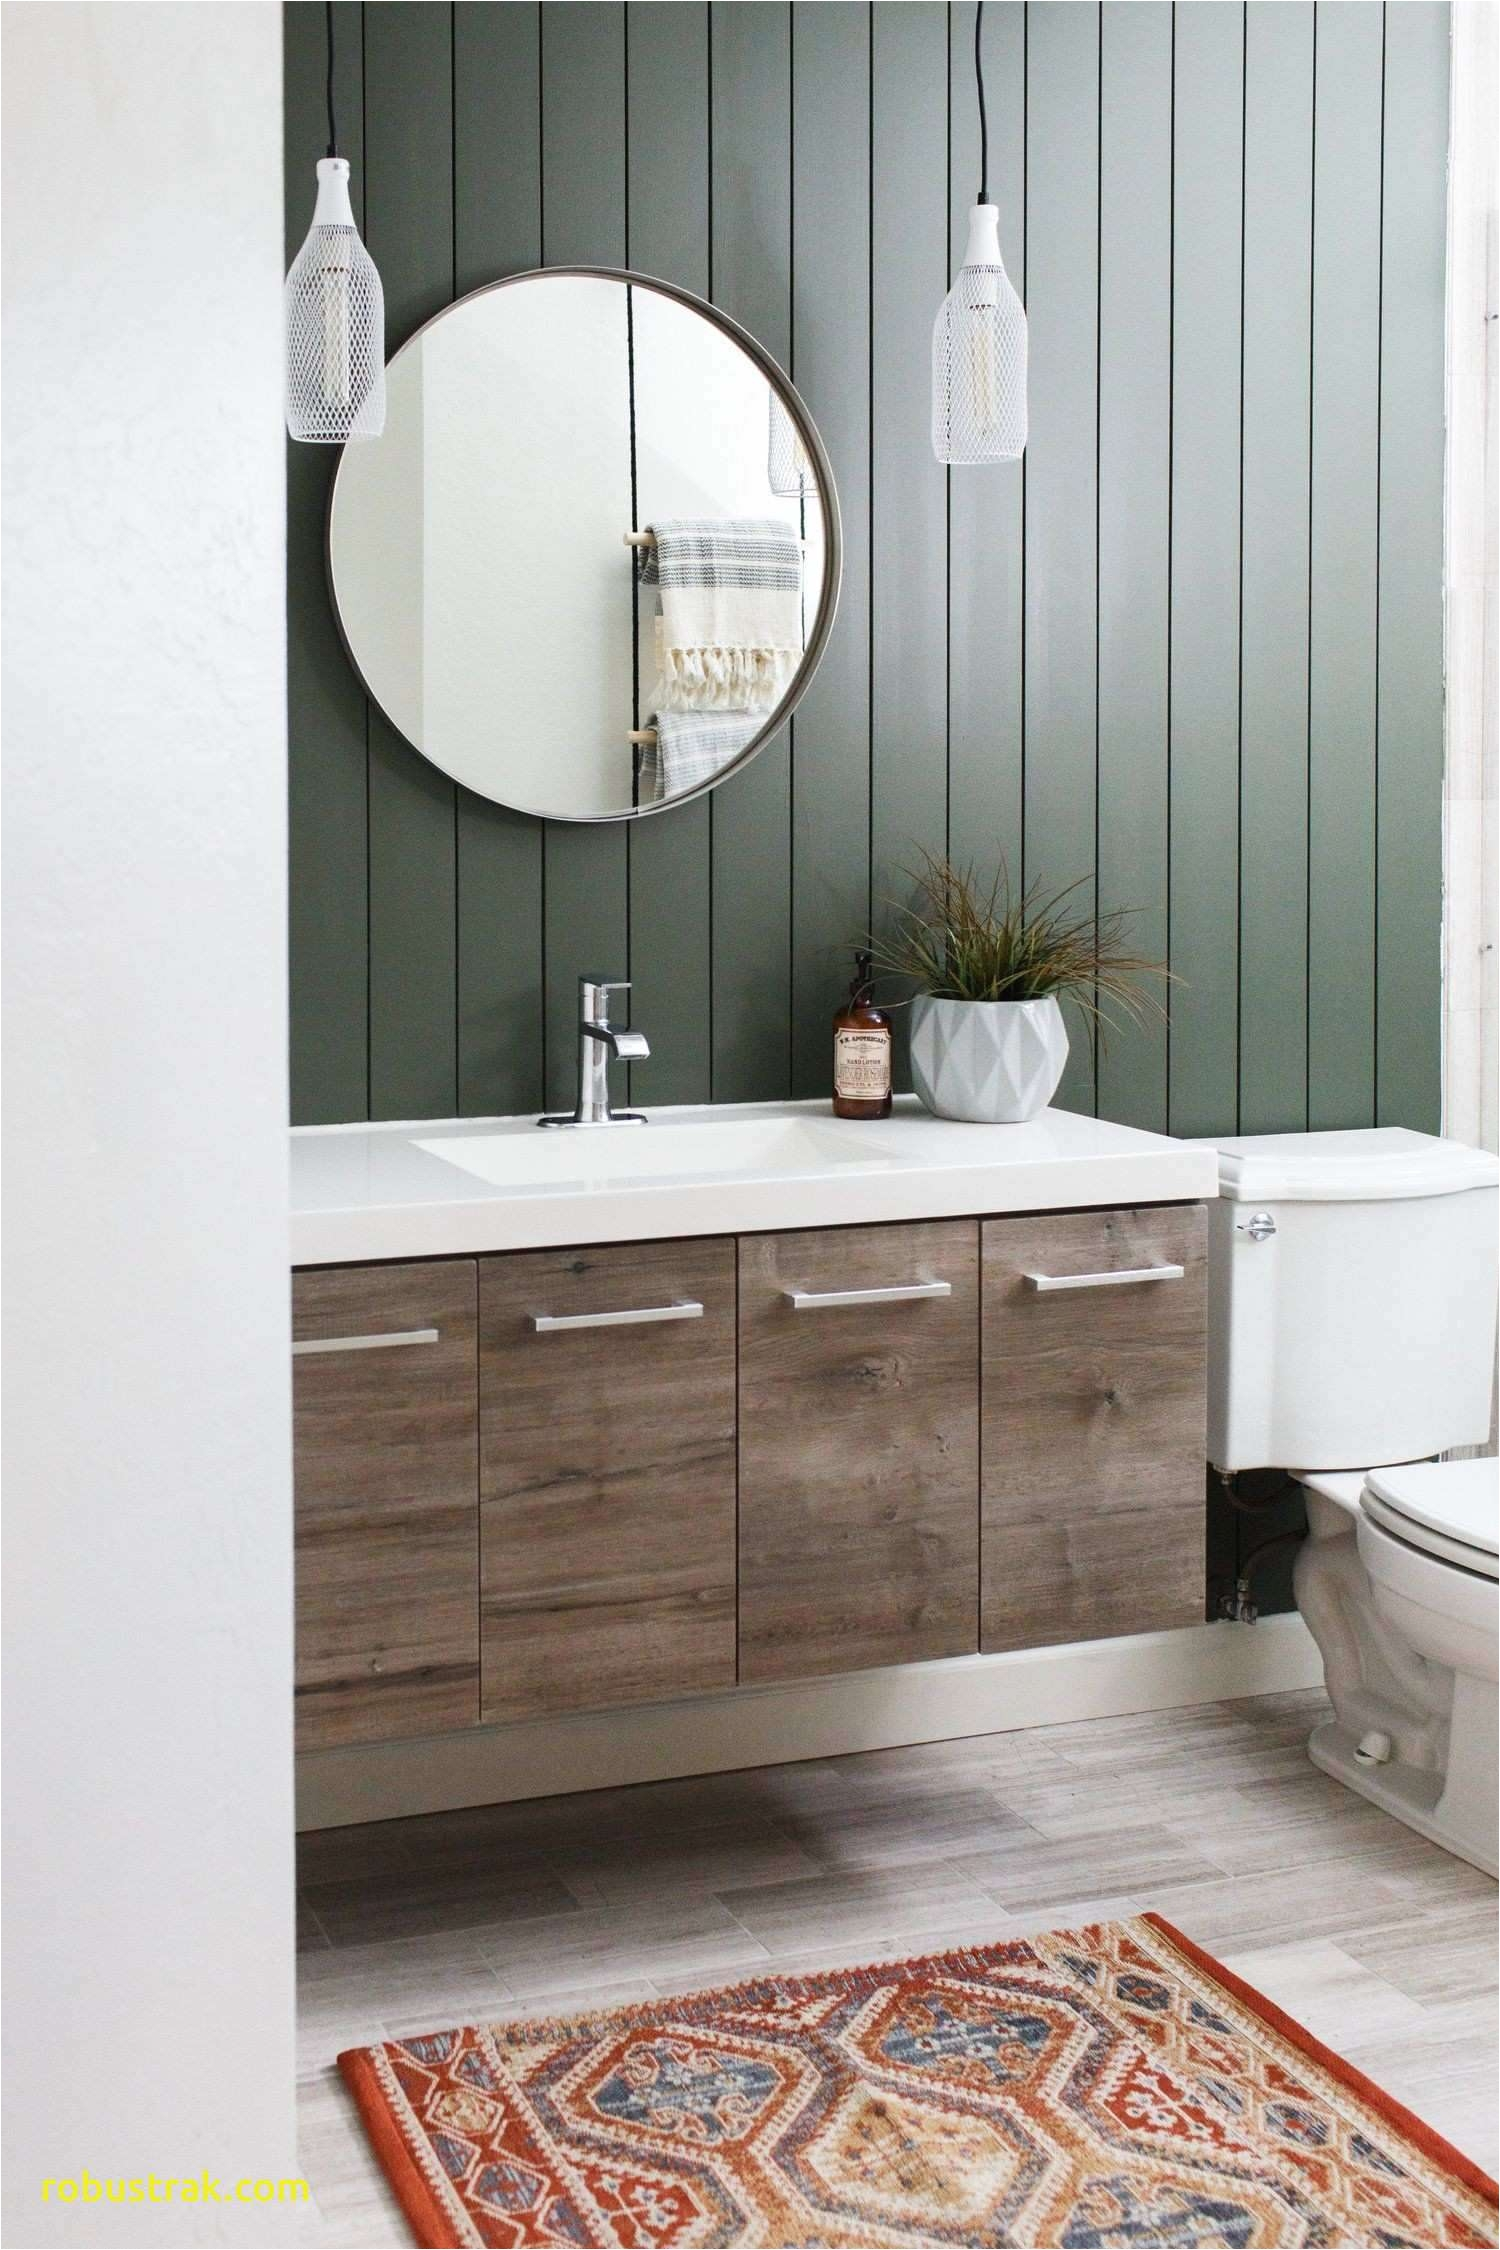 Light Over Mirror In Bathroom Luxury Diy Bathroom Light Luxury H Sink Install Bathroom I 0d